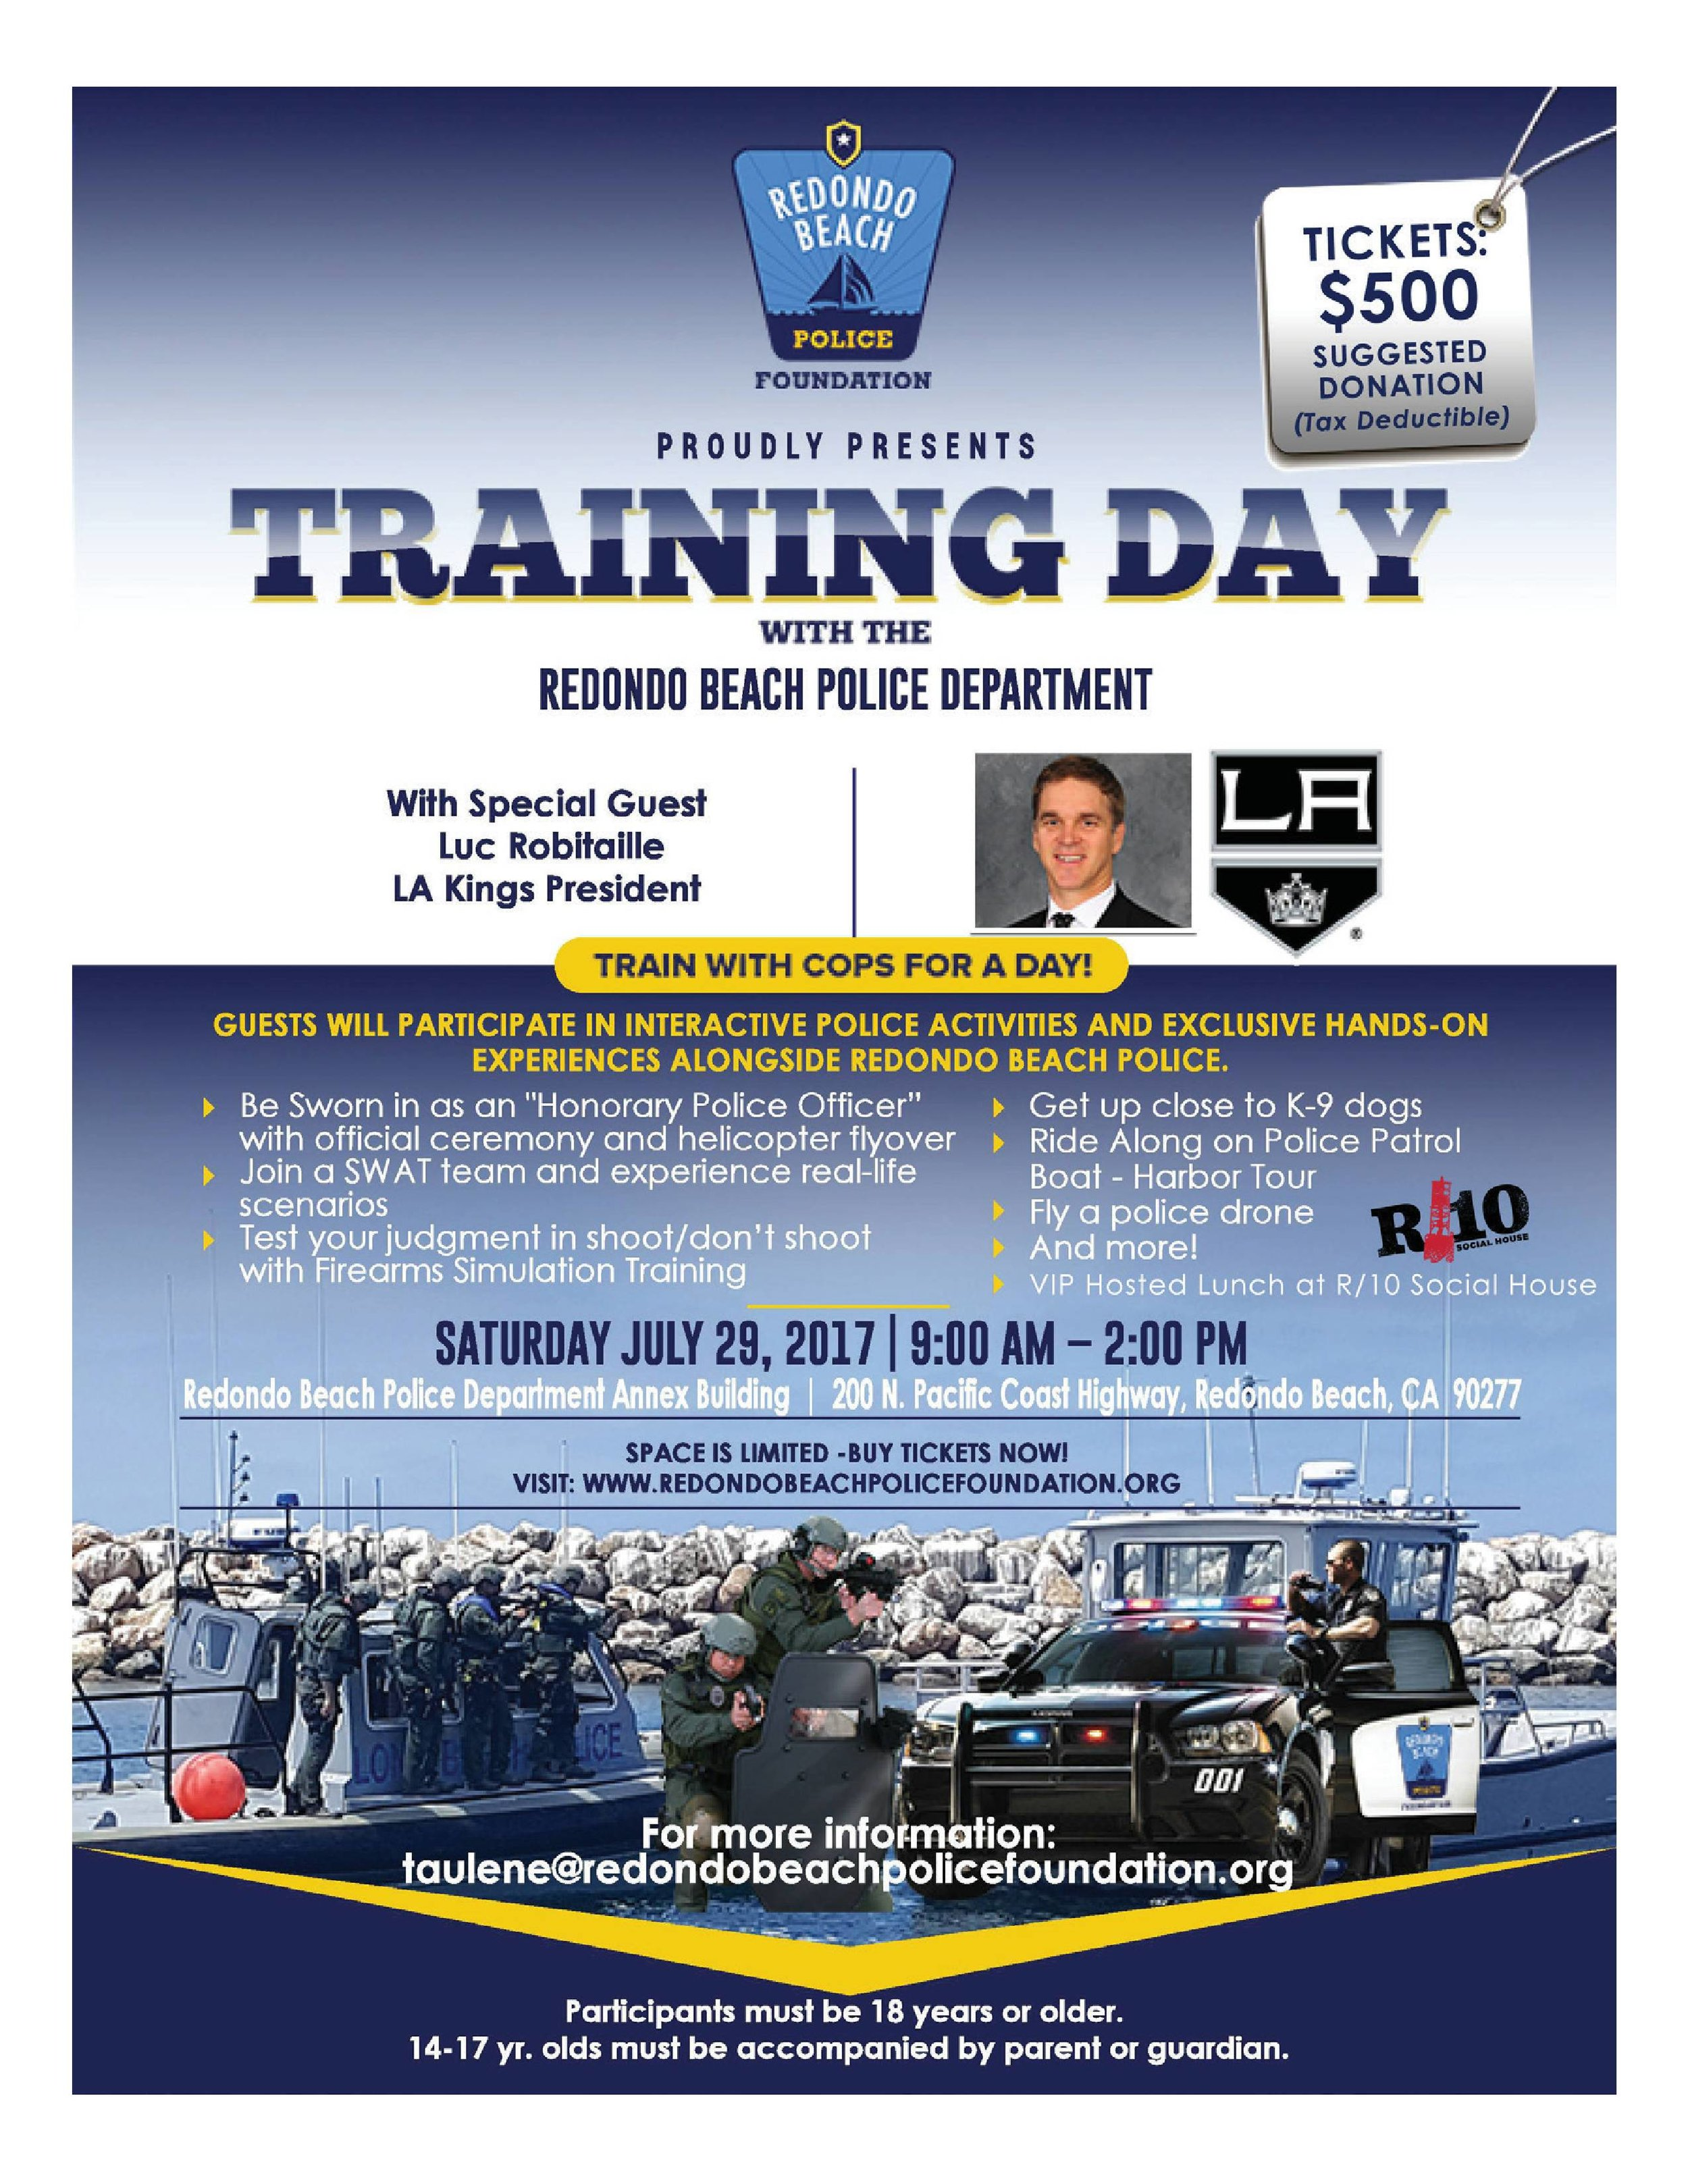 RBPF Training Day Event Flyer_FINAL.jpg